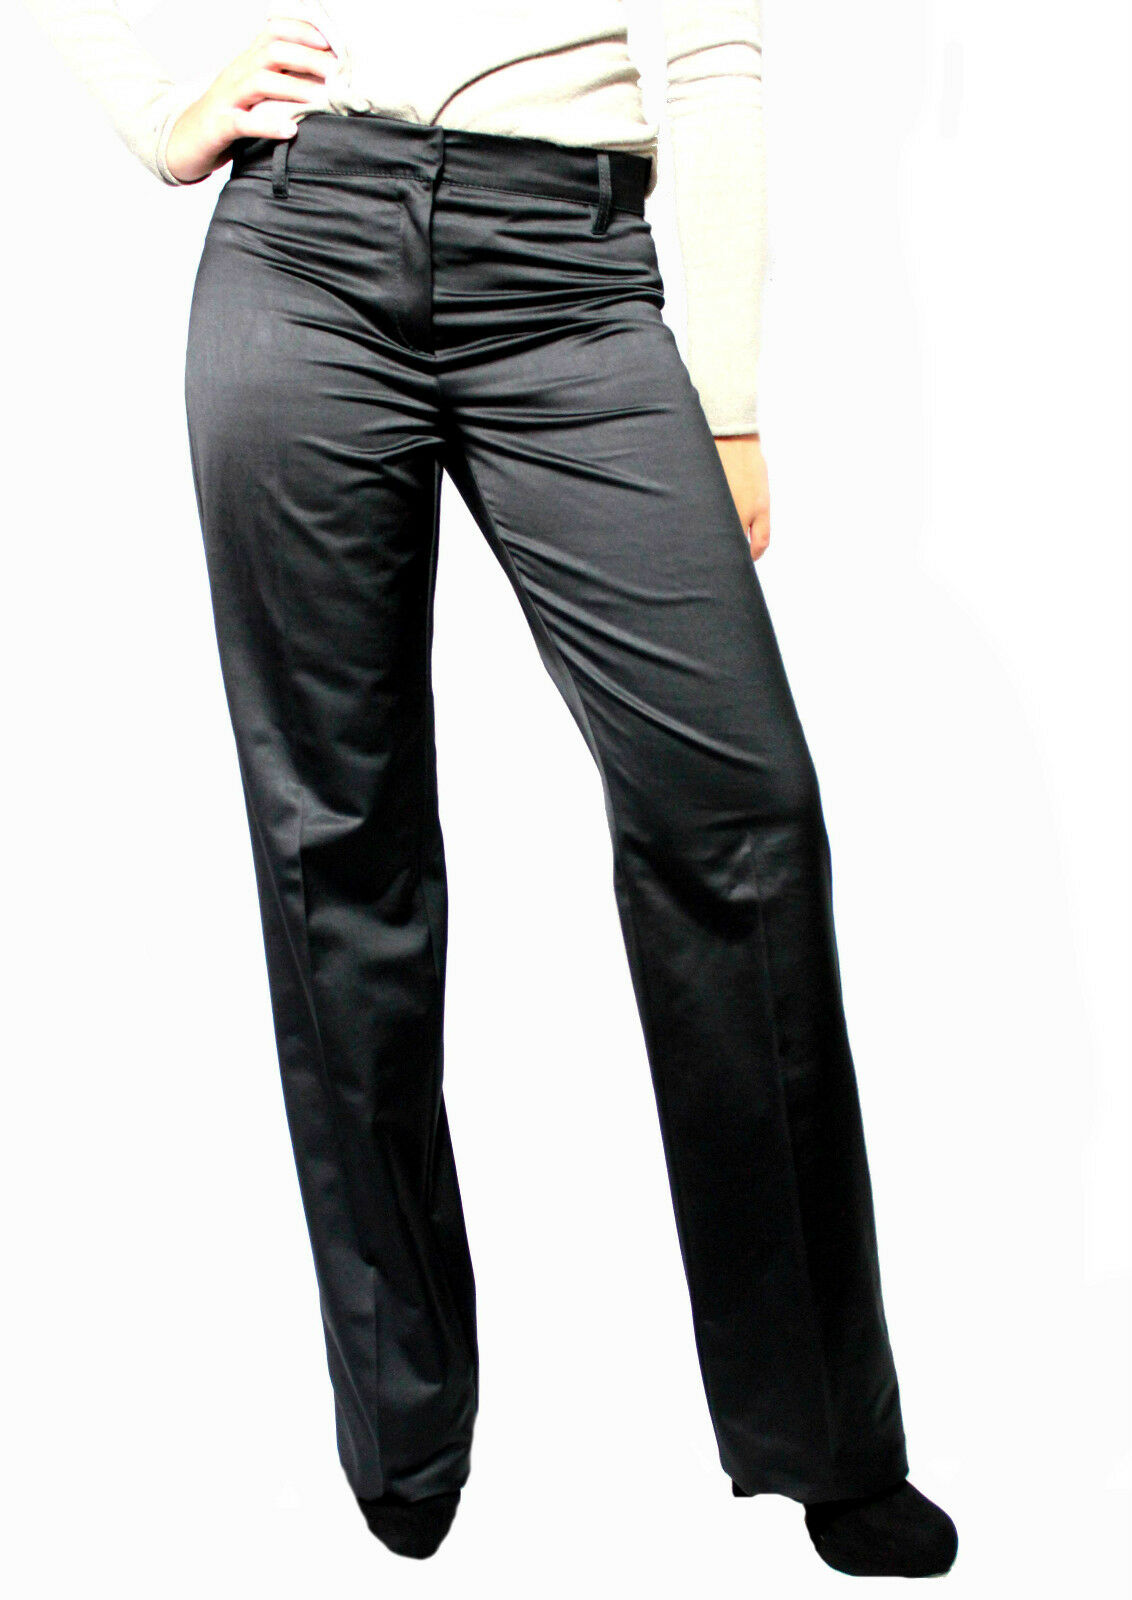 b04fe058fe99 MARELLA pantalone donna nera fondo fondo fondo cm 25 MADE IN ITALY 30fb85